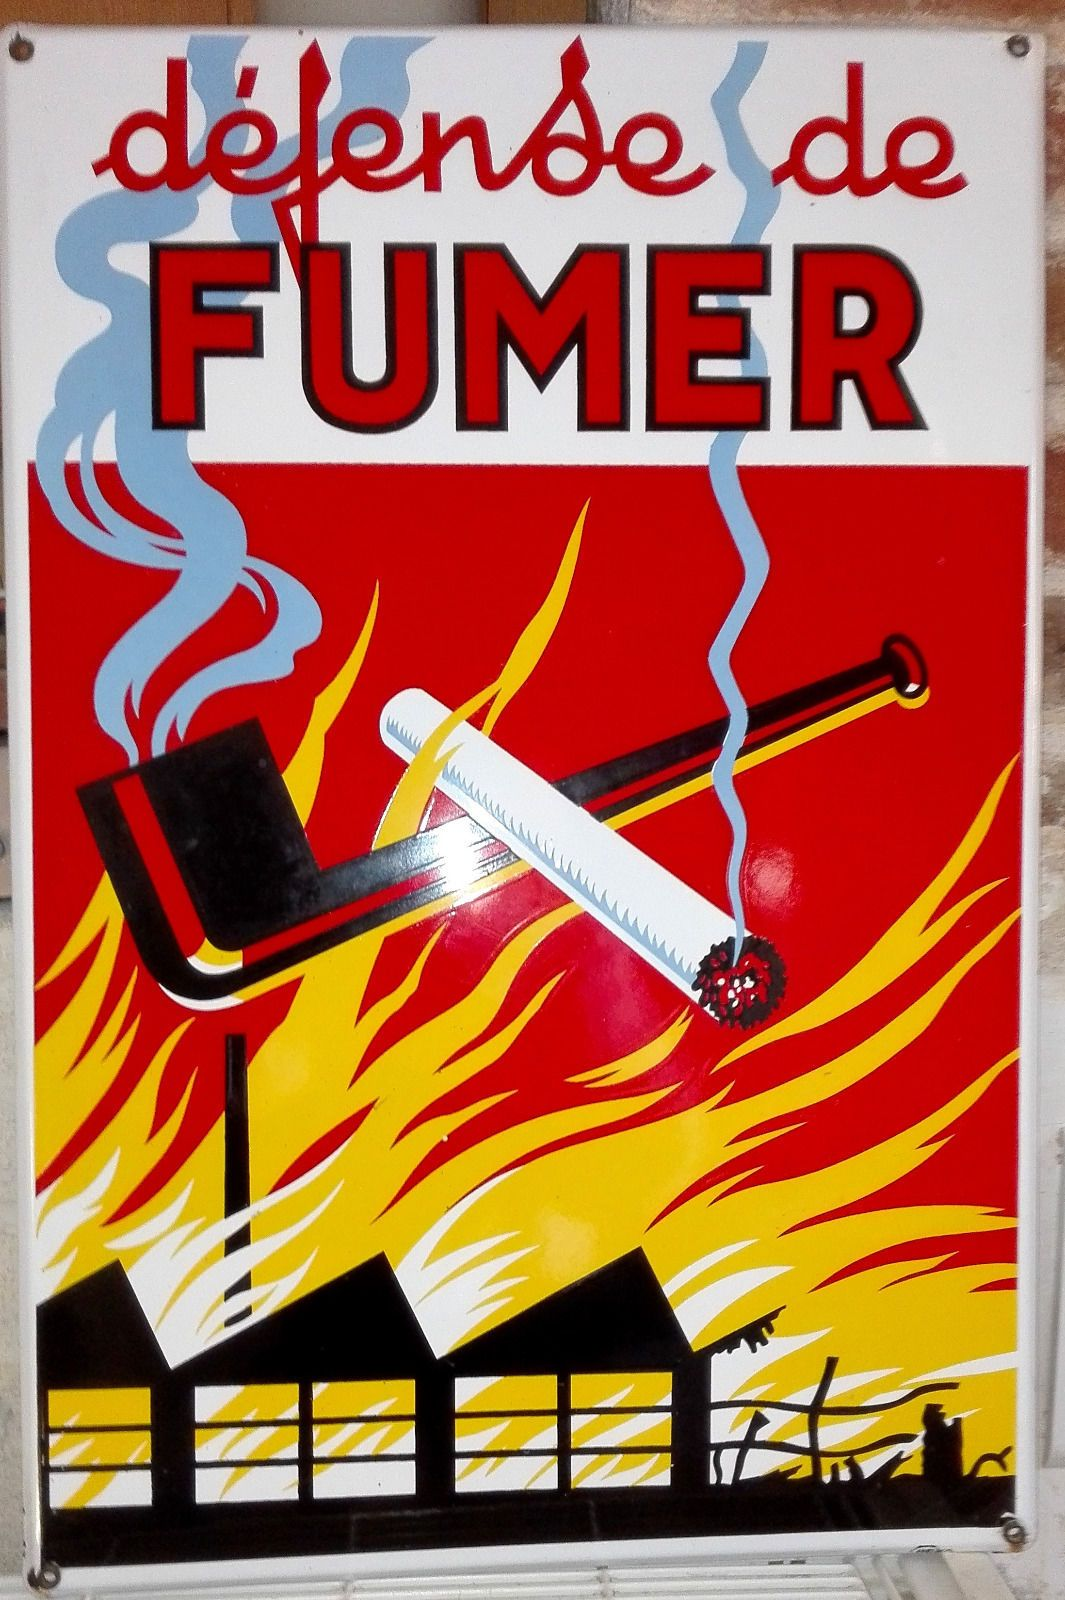 Belle Plaque Emaill E Peu Commune Defense De Fumer Superbe Tat